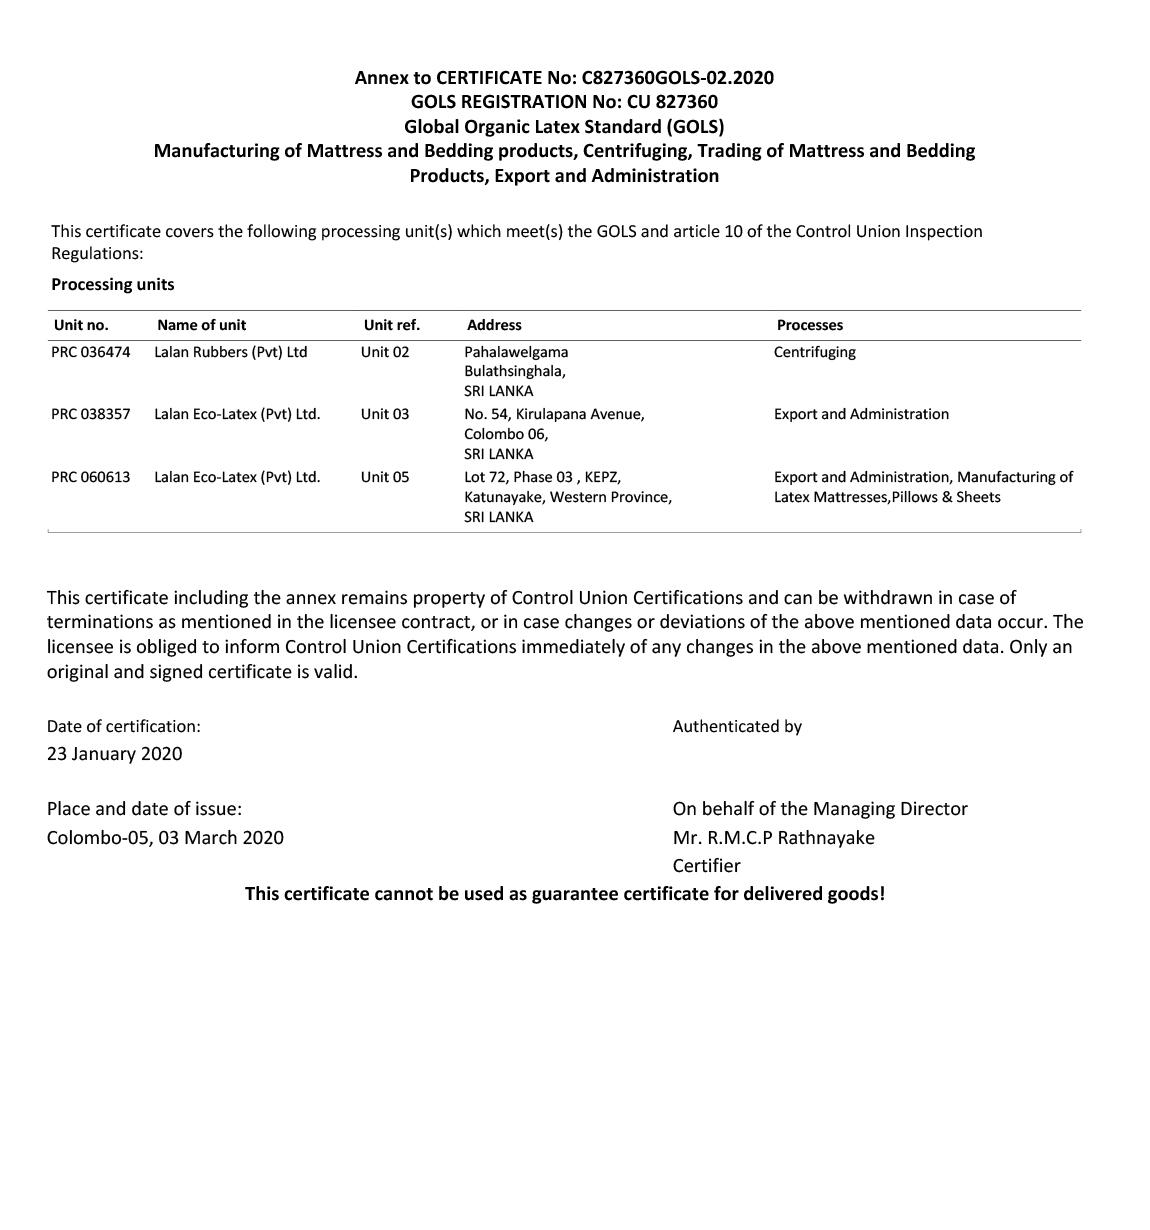 Global Organic Latex Certification